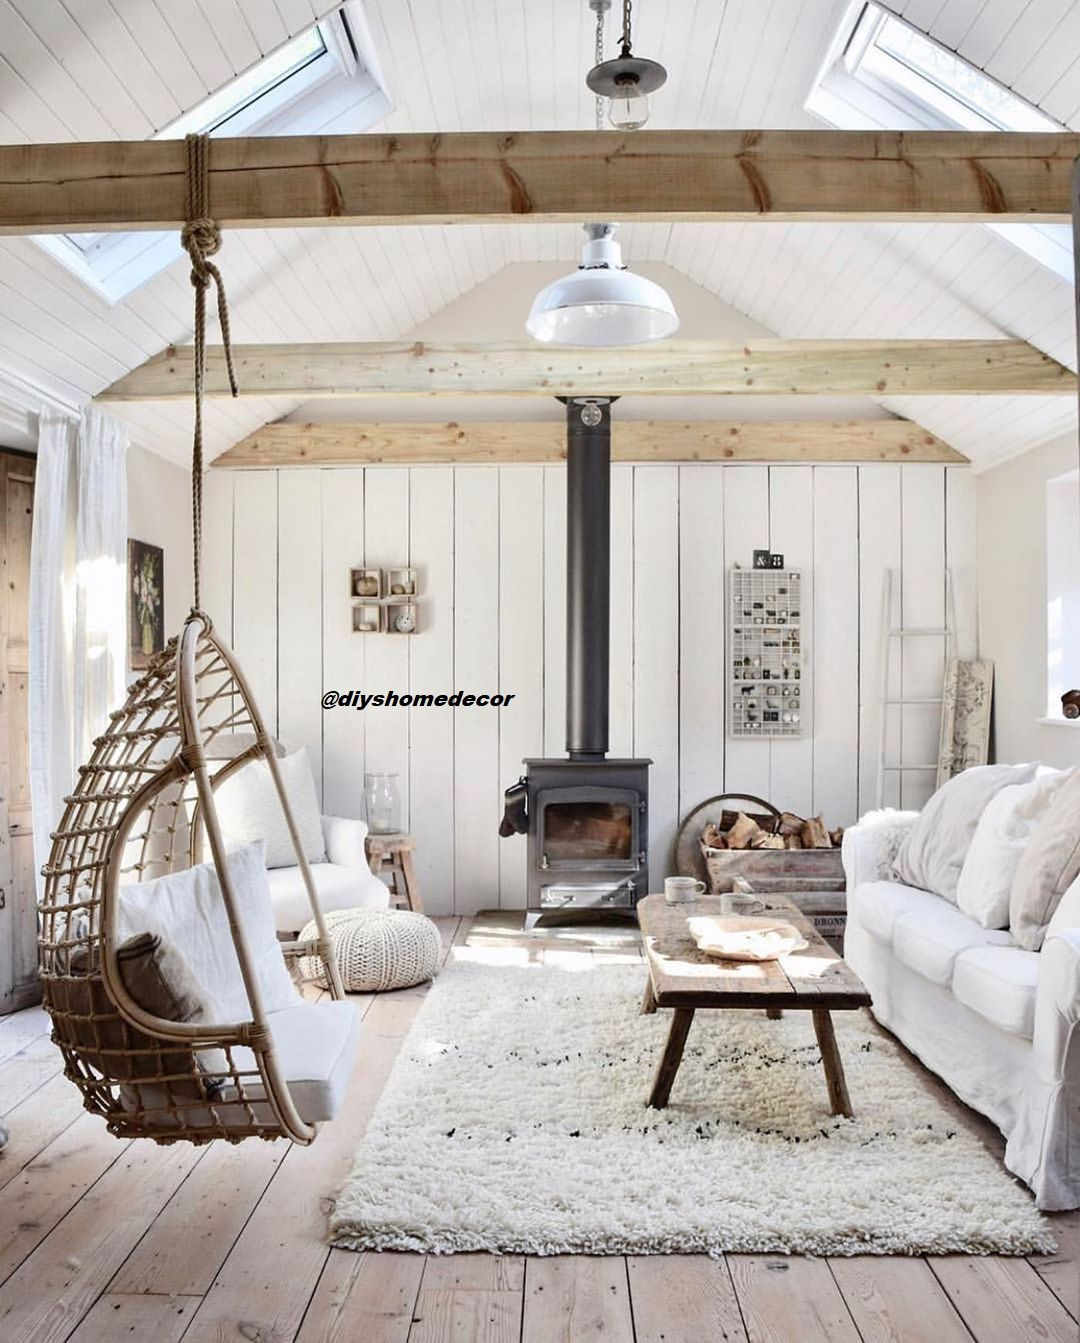 Pin by DIYS Home Decor on Home Decor | Trendy home decor ...